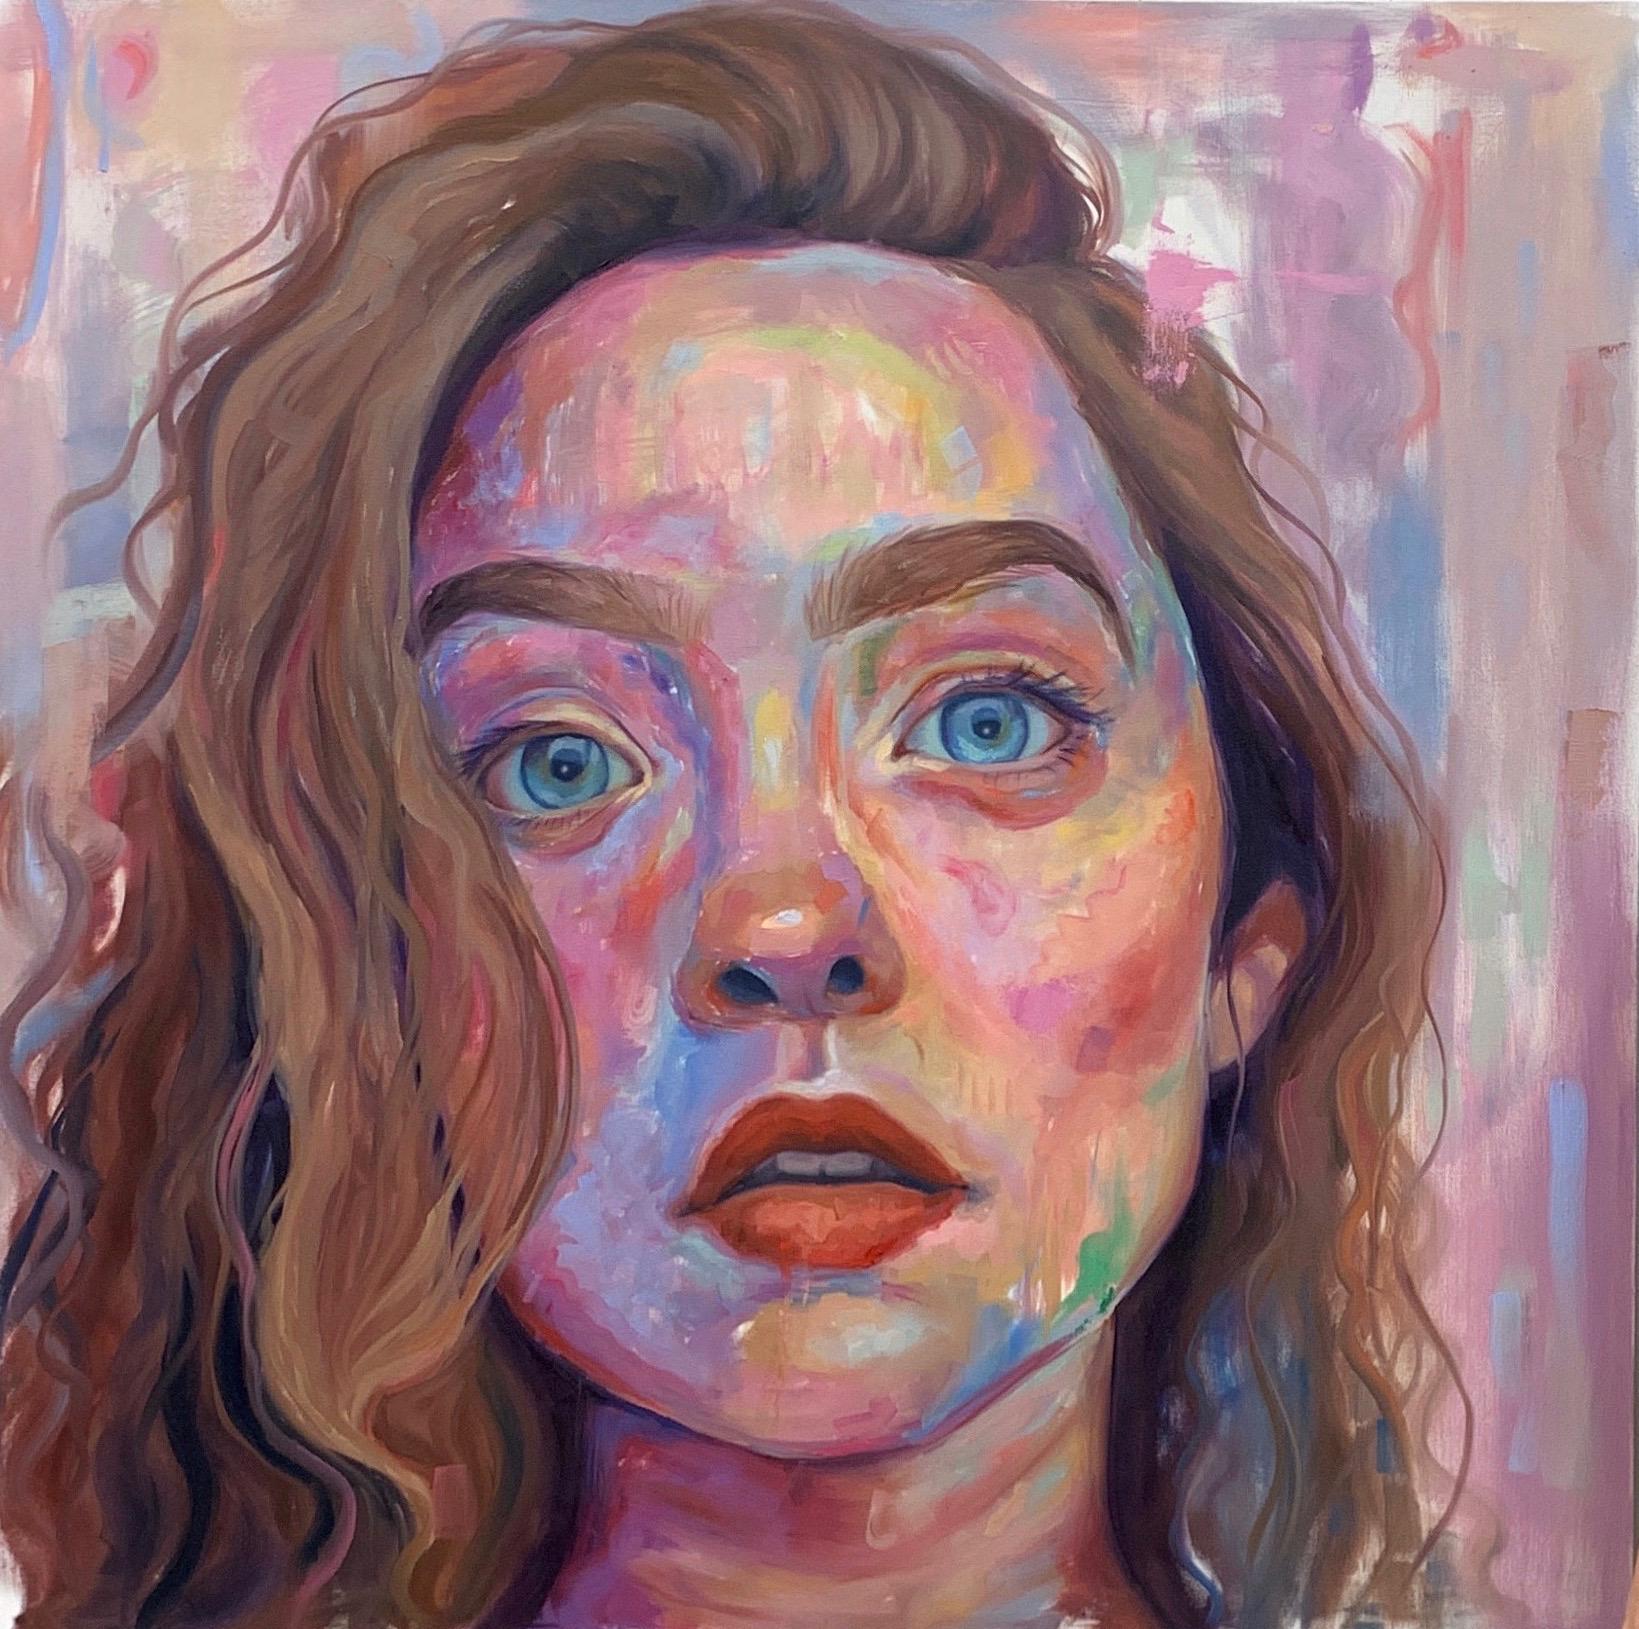 Image of work by Gabbi Maria